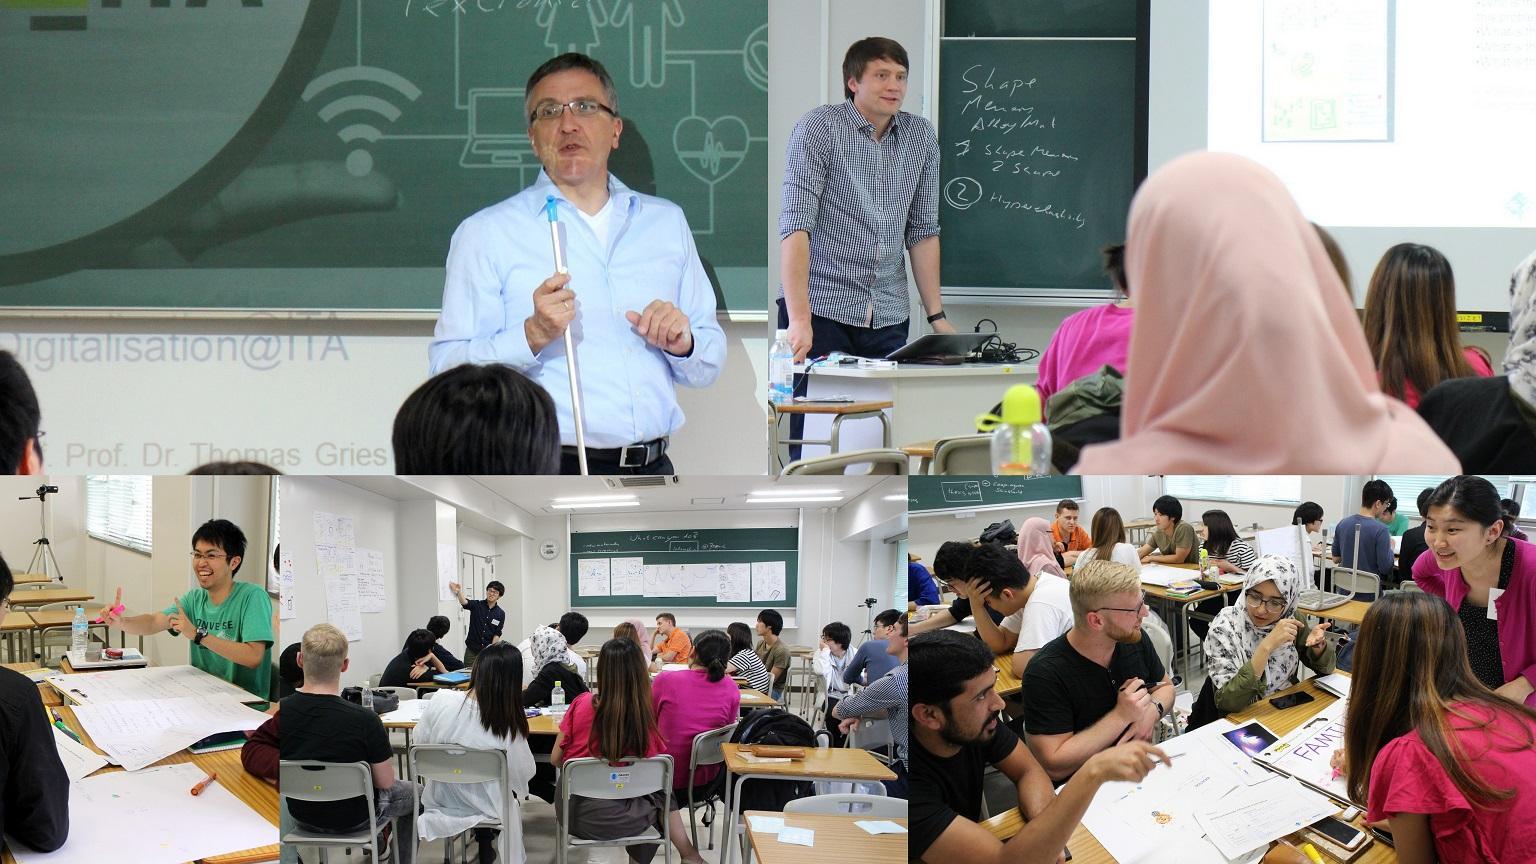 http://www.shinshu-u.ac.jp/project/leading/news/Prof.Gries201806-1.jpg